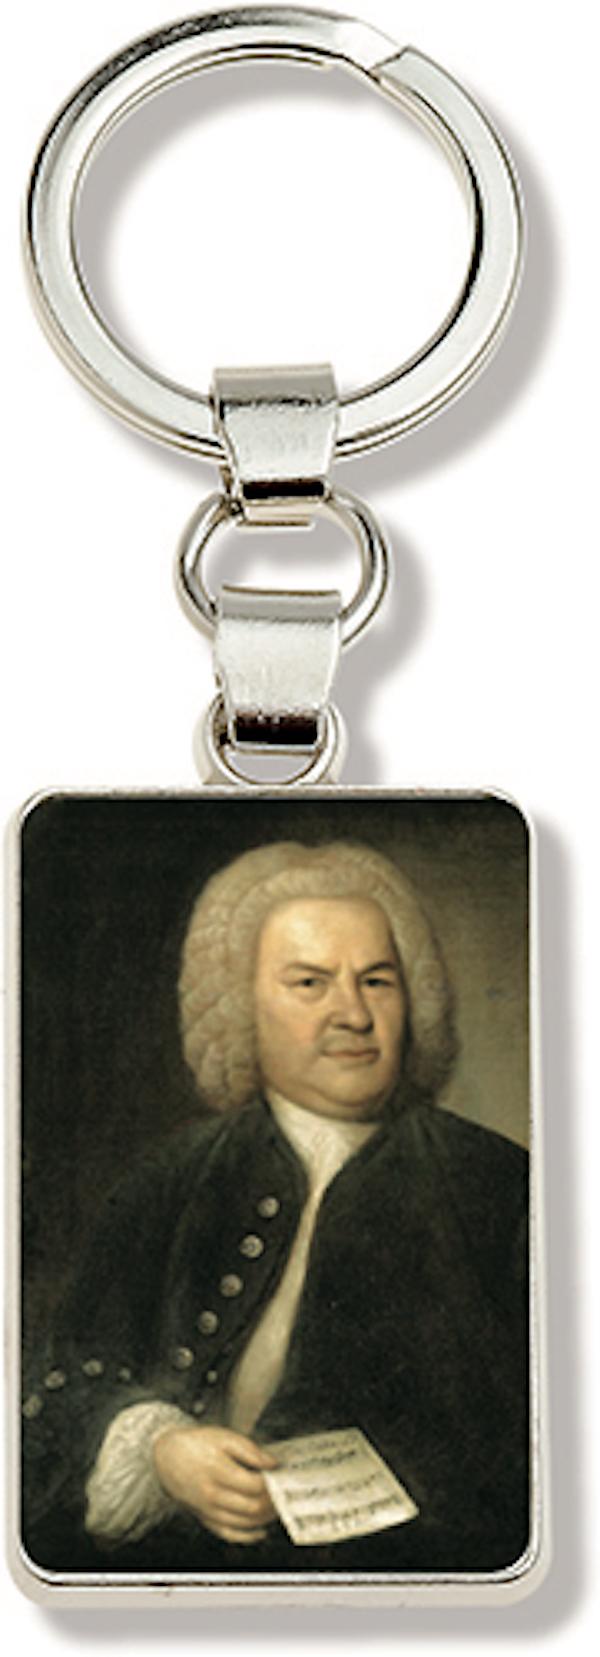 Schlüsselanhänger Bach Portrait